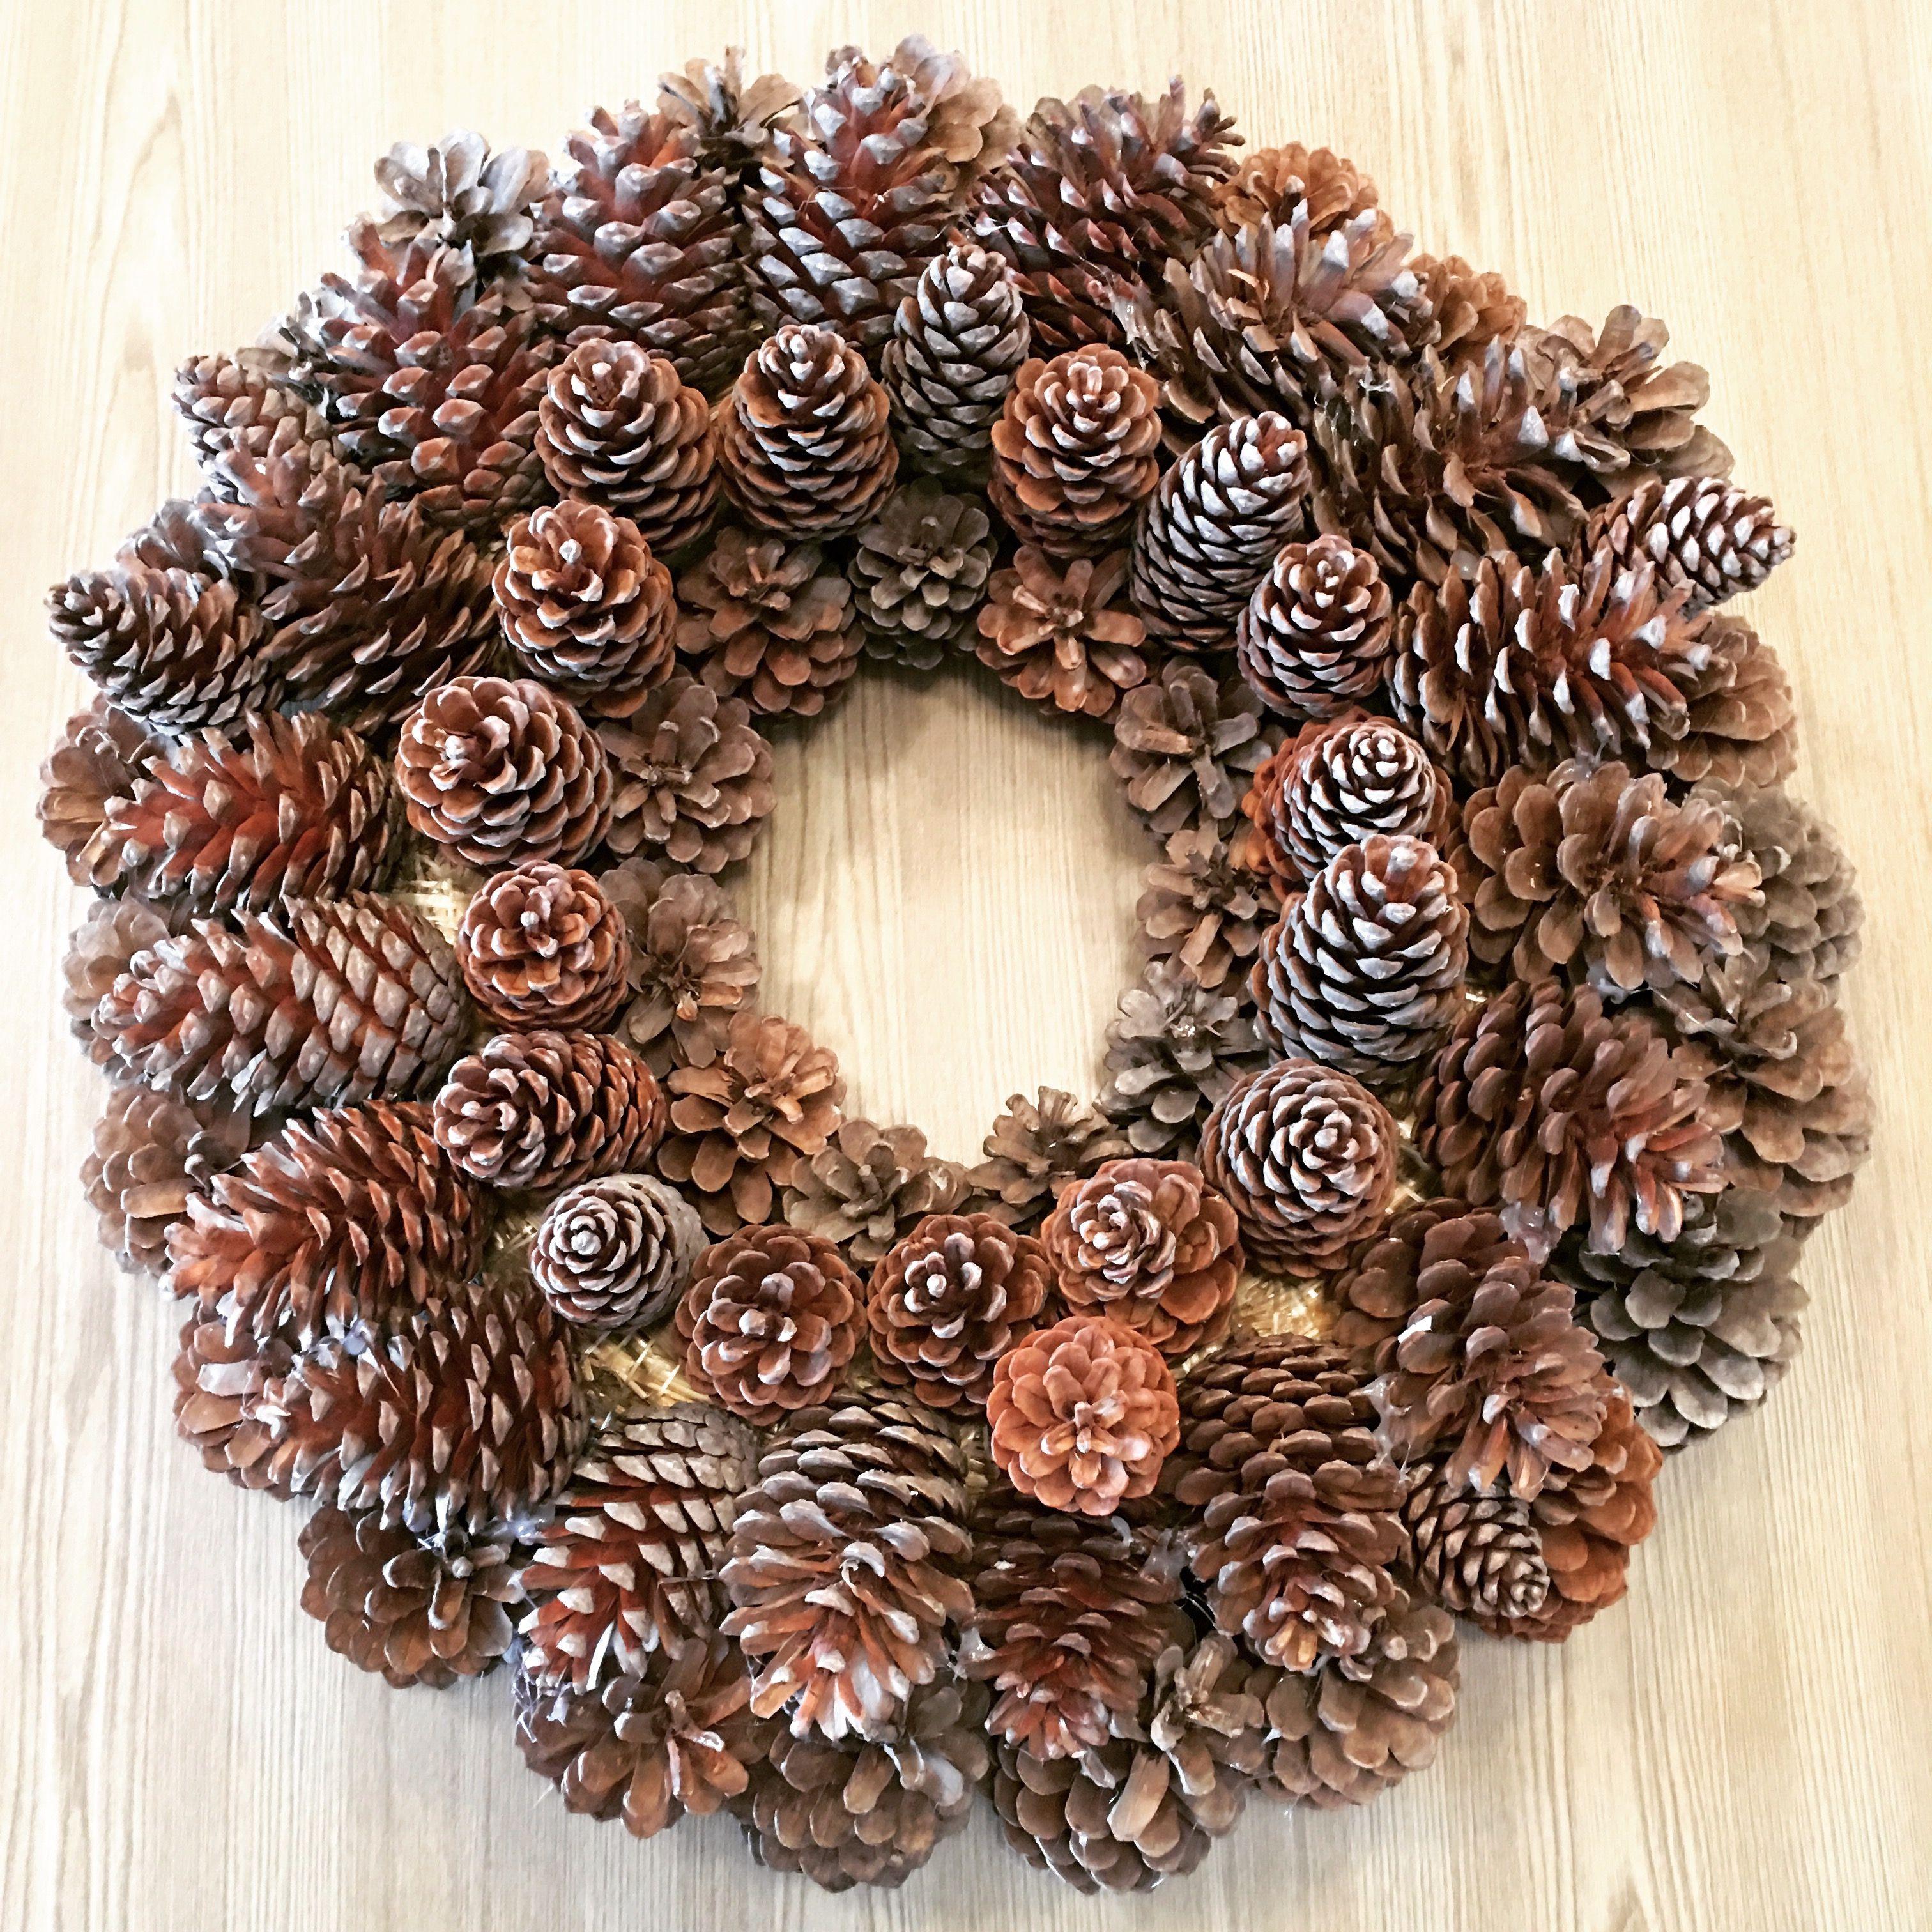 Decorating with pinecones